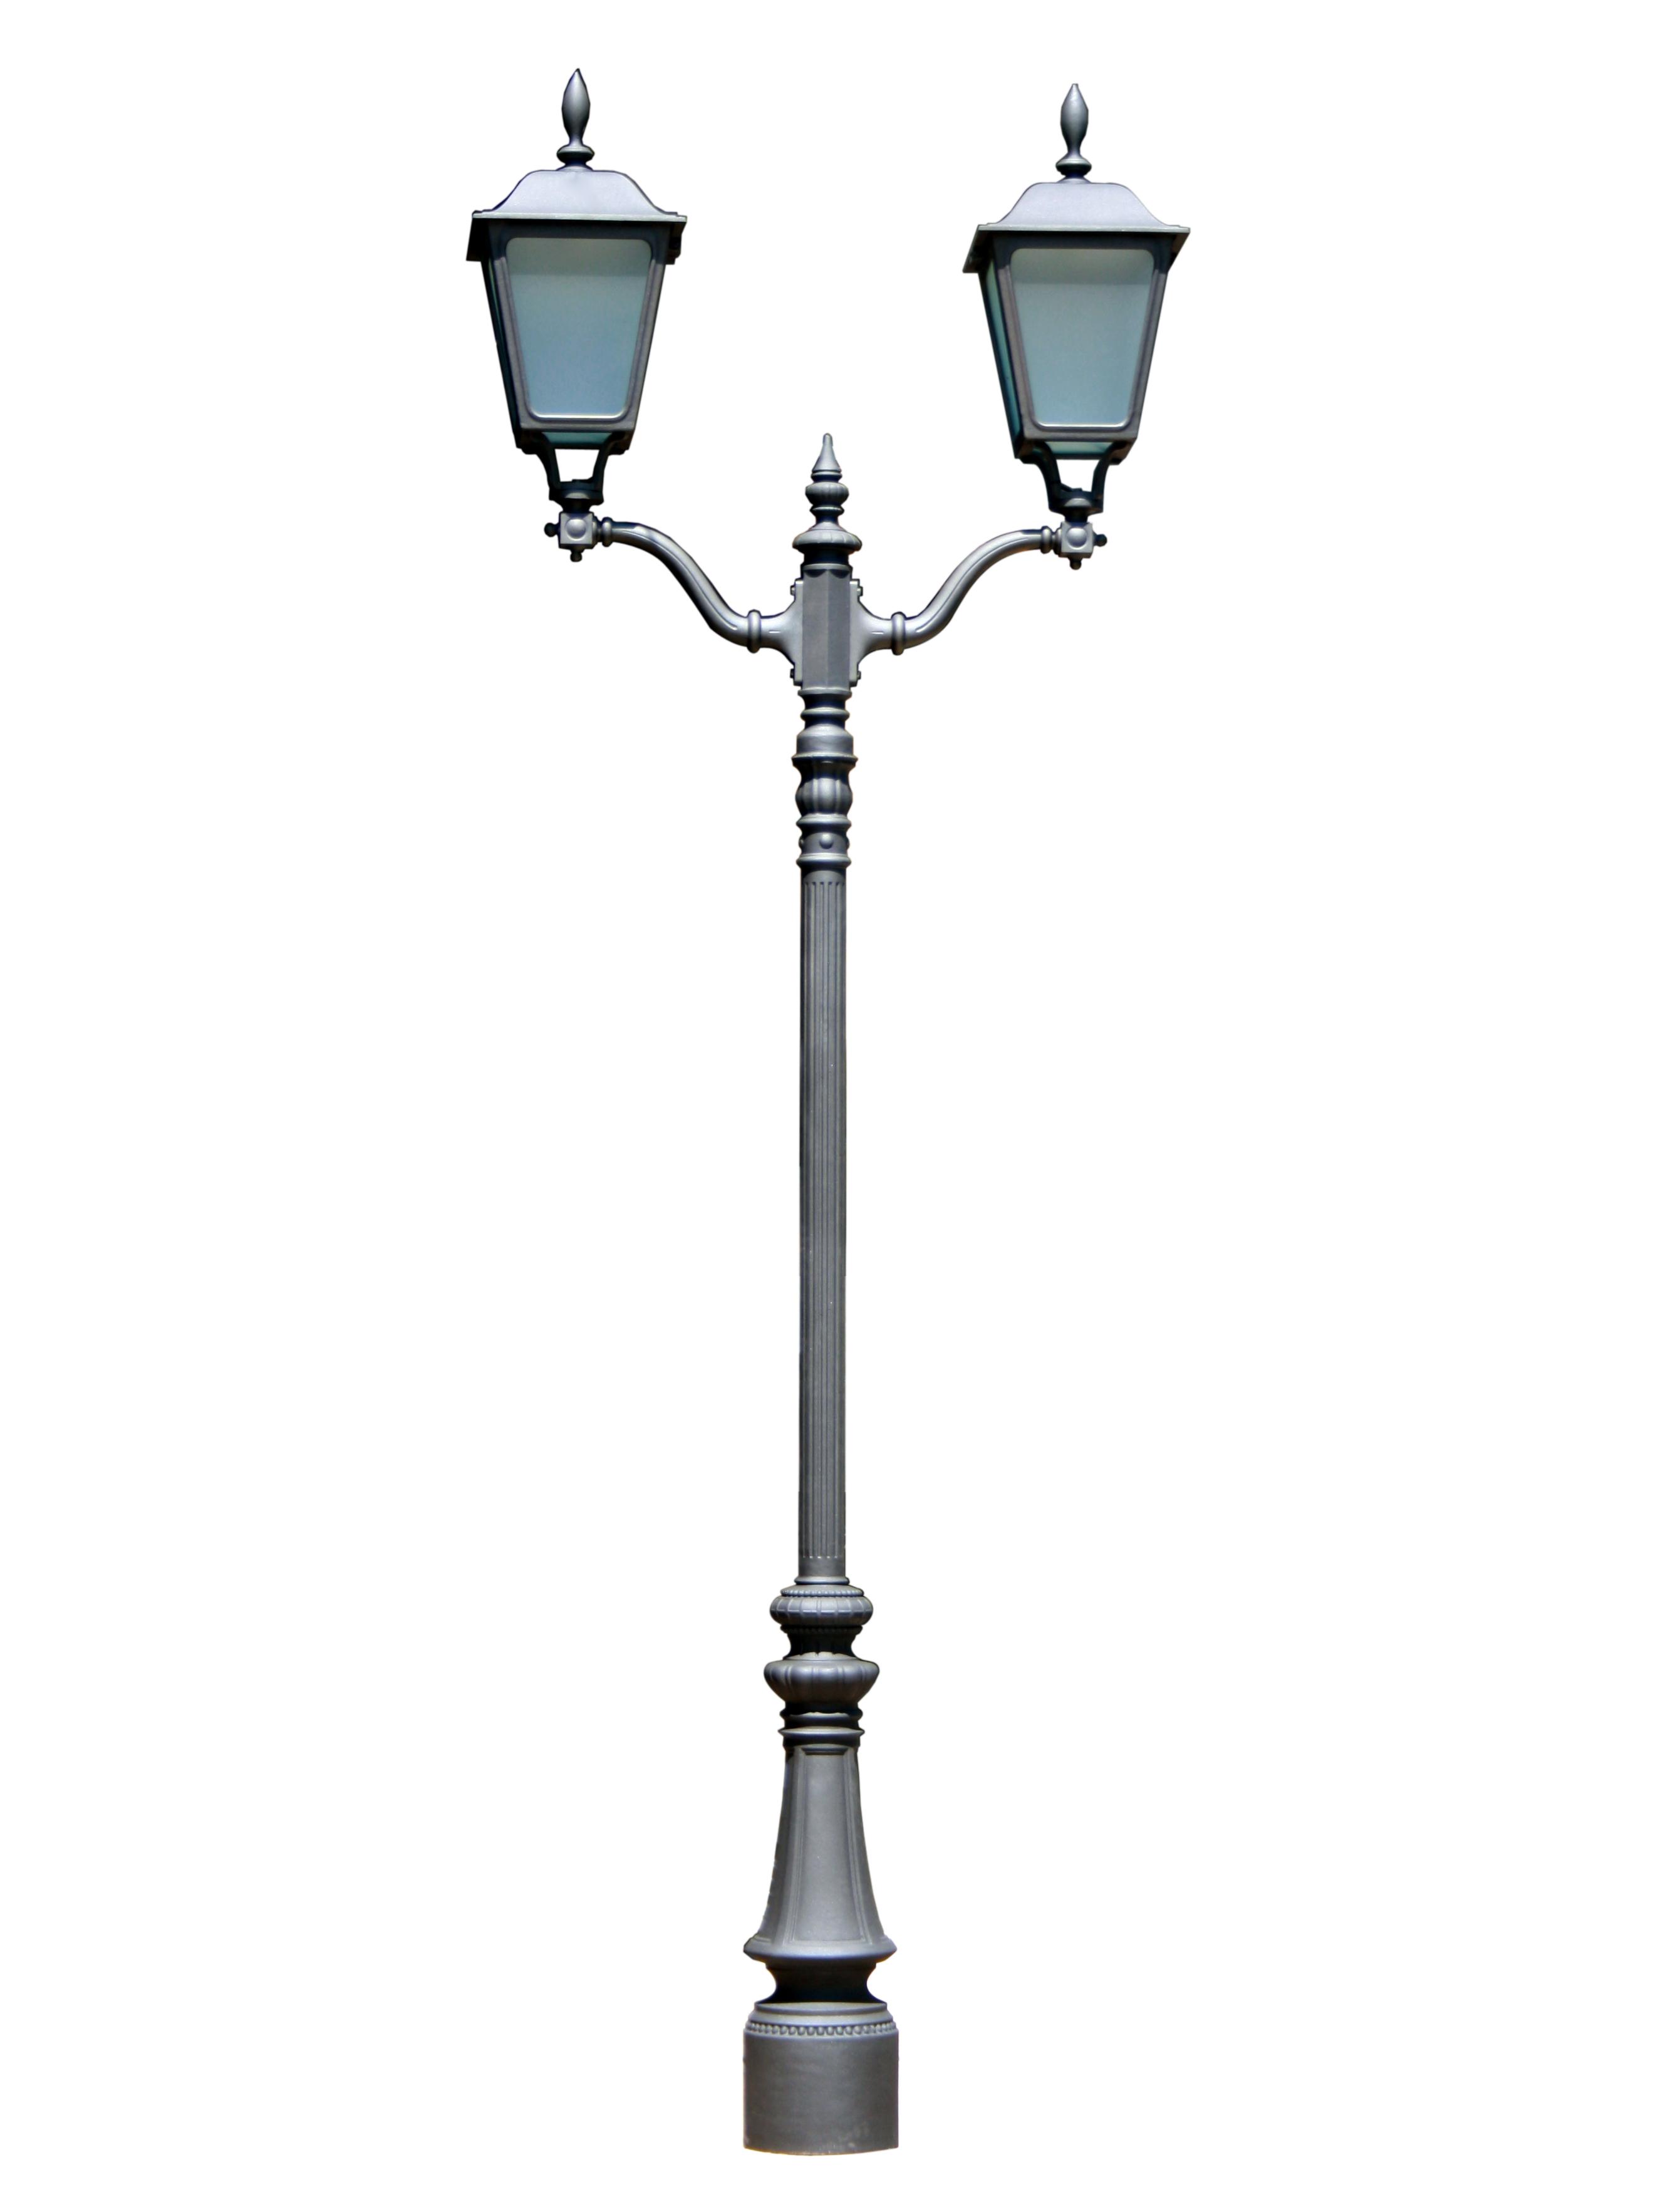 Stalpi ornamentali pentru iluminat stradal, parcuri, gradini BRAMAL LIGHT - Poza 5